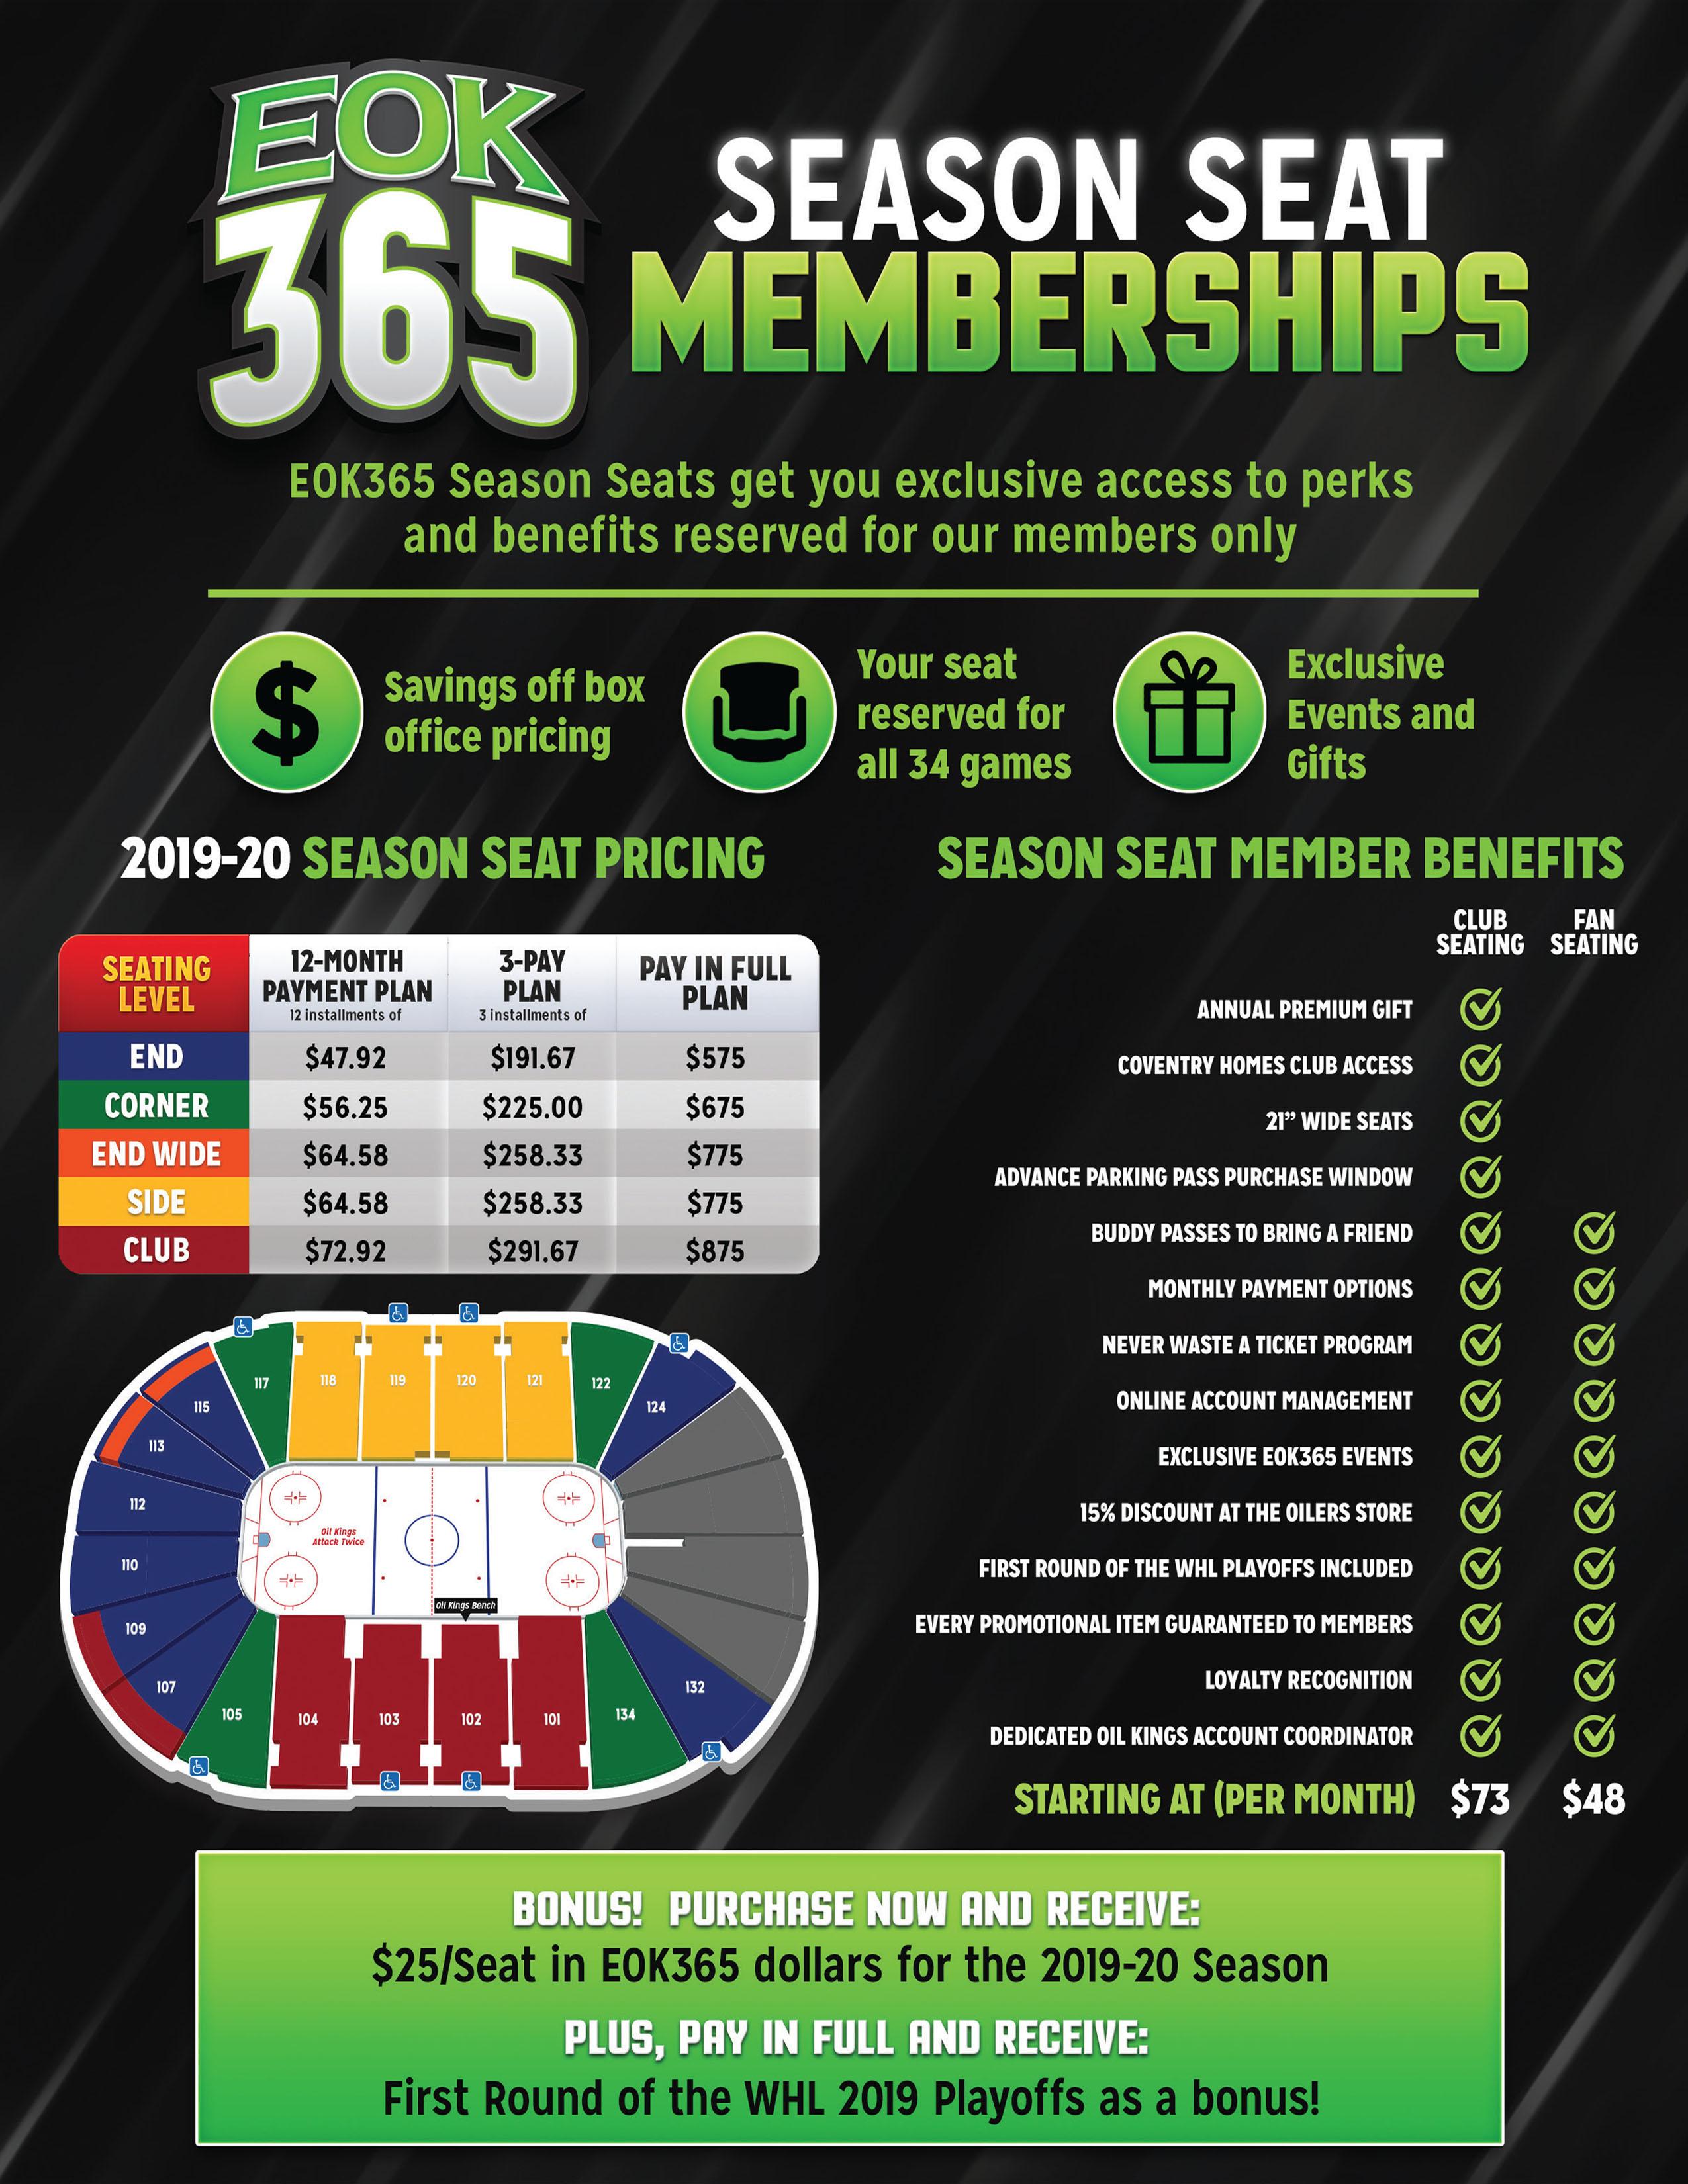 EOK365 Season Seat Membership Pricing